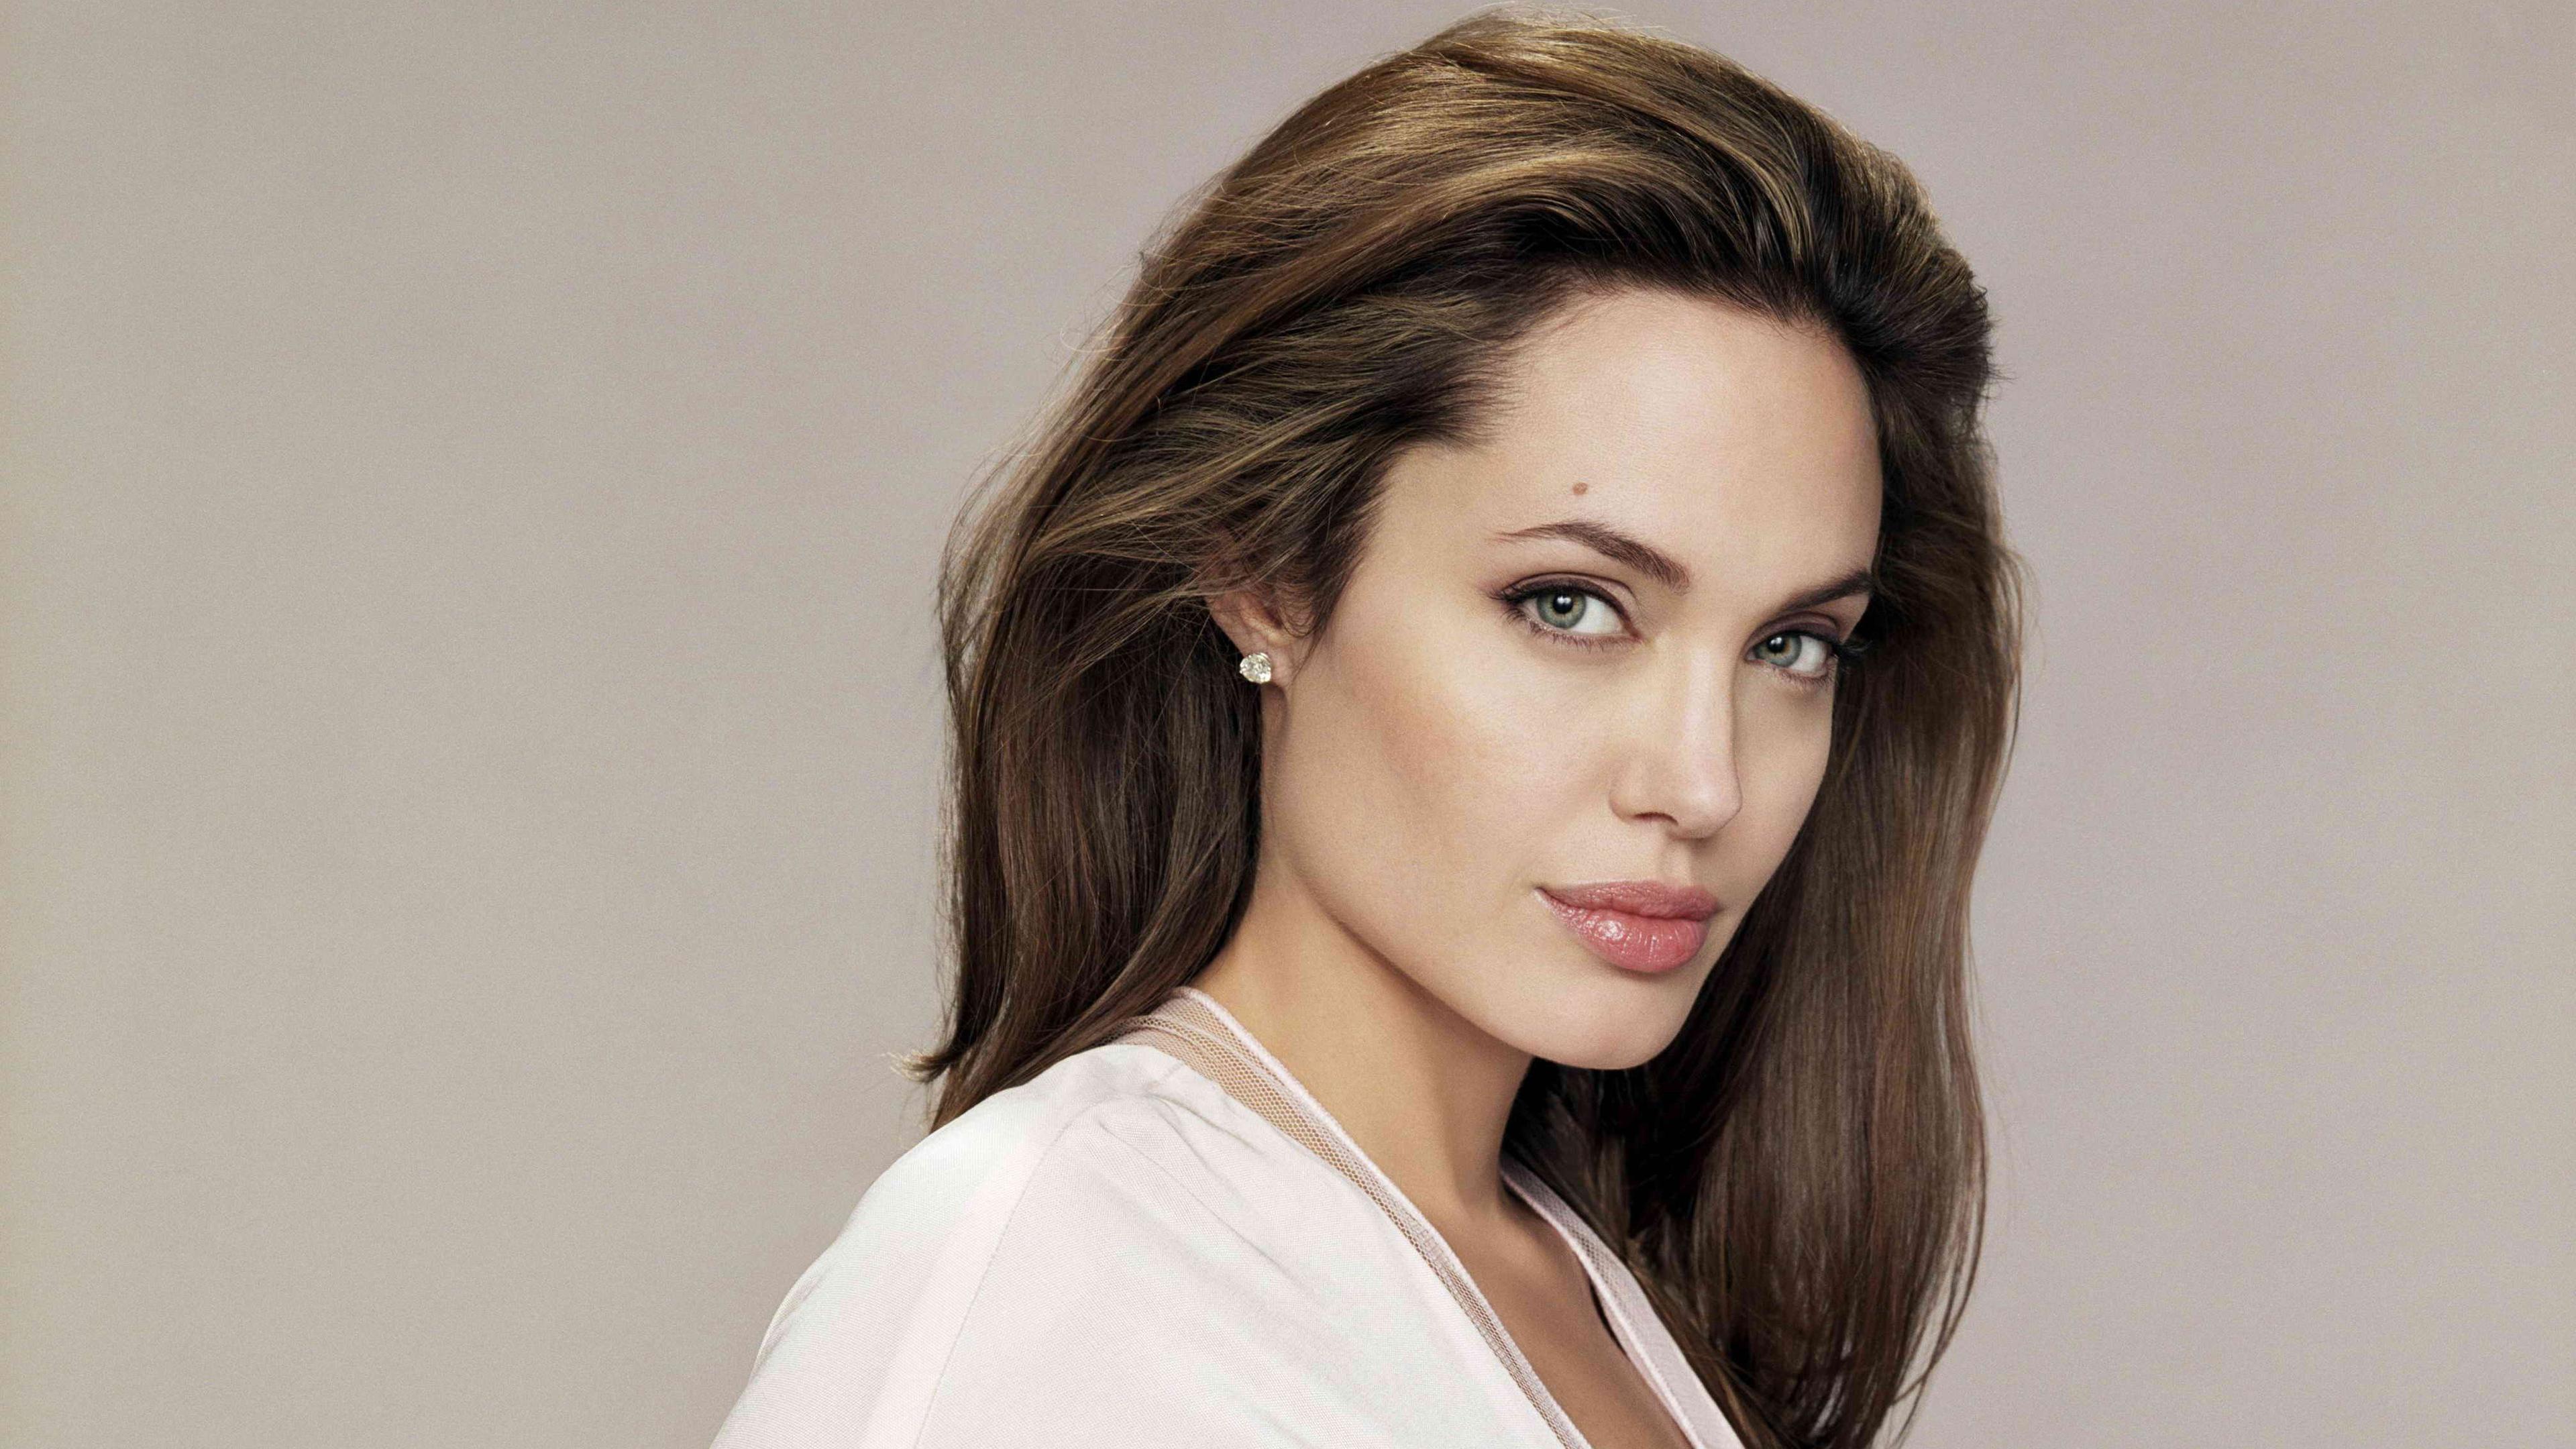 angelina jolie 4k 2018 1543103930 - Angelina Jolie 4k 2018 - hd-wallpapers, girls wallpapers, celebrities wallpapers, angelina jolie wallpapers, 4k-wallpapers